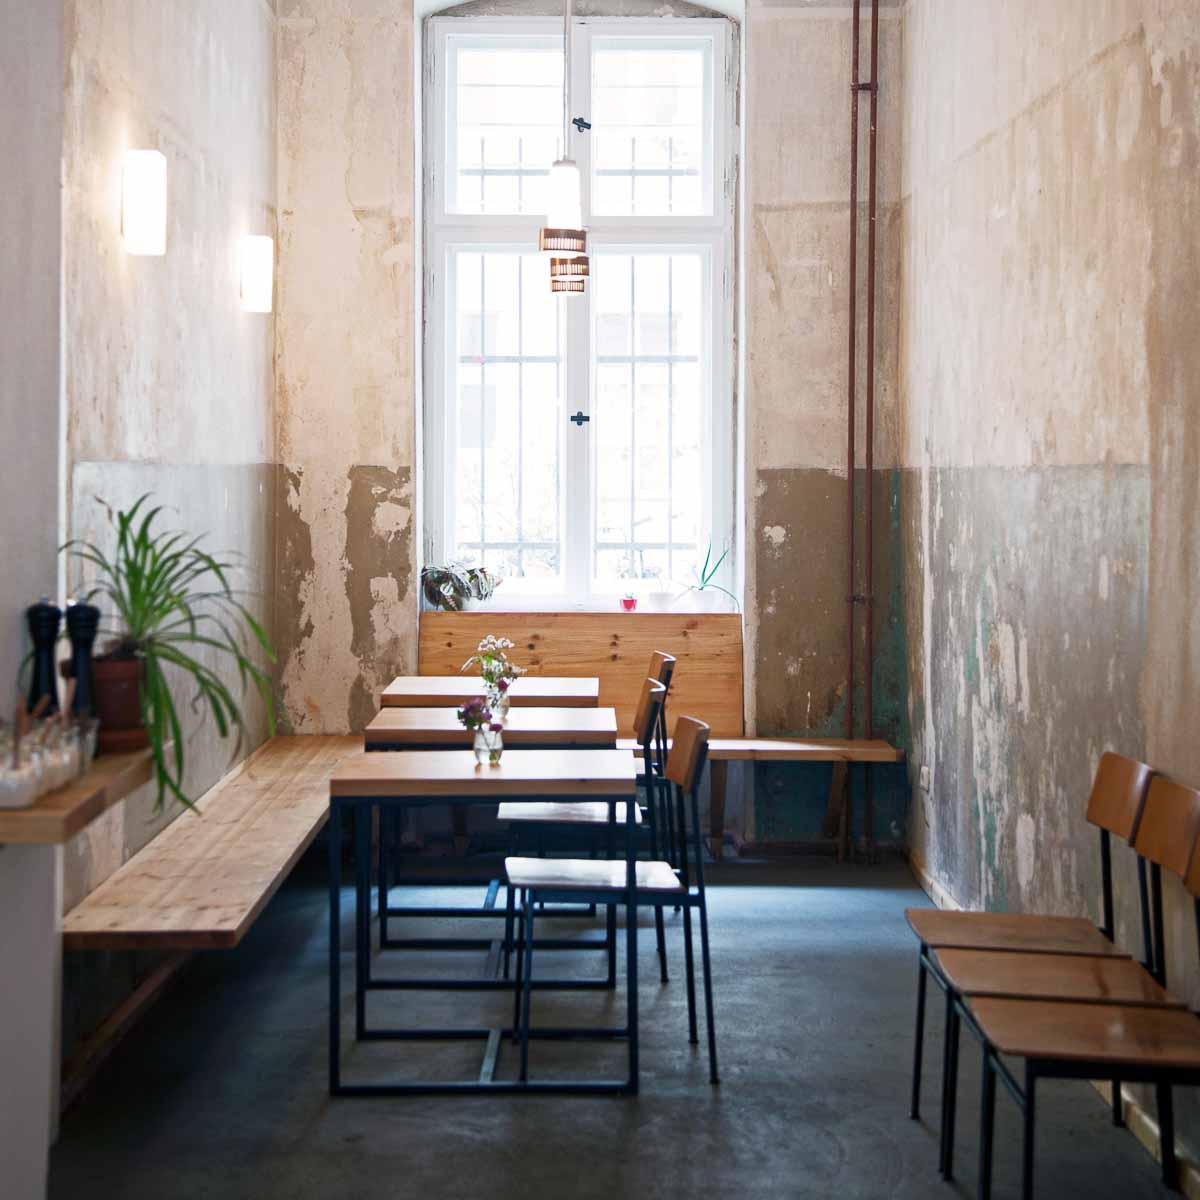 Neumanns Cafe Friedrichshain Interieur